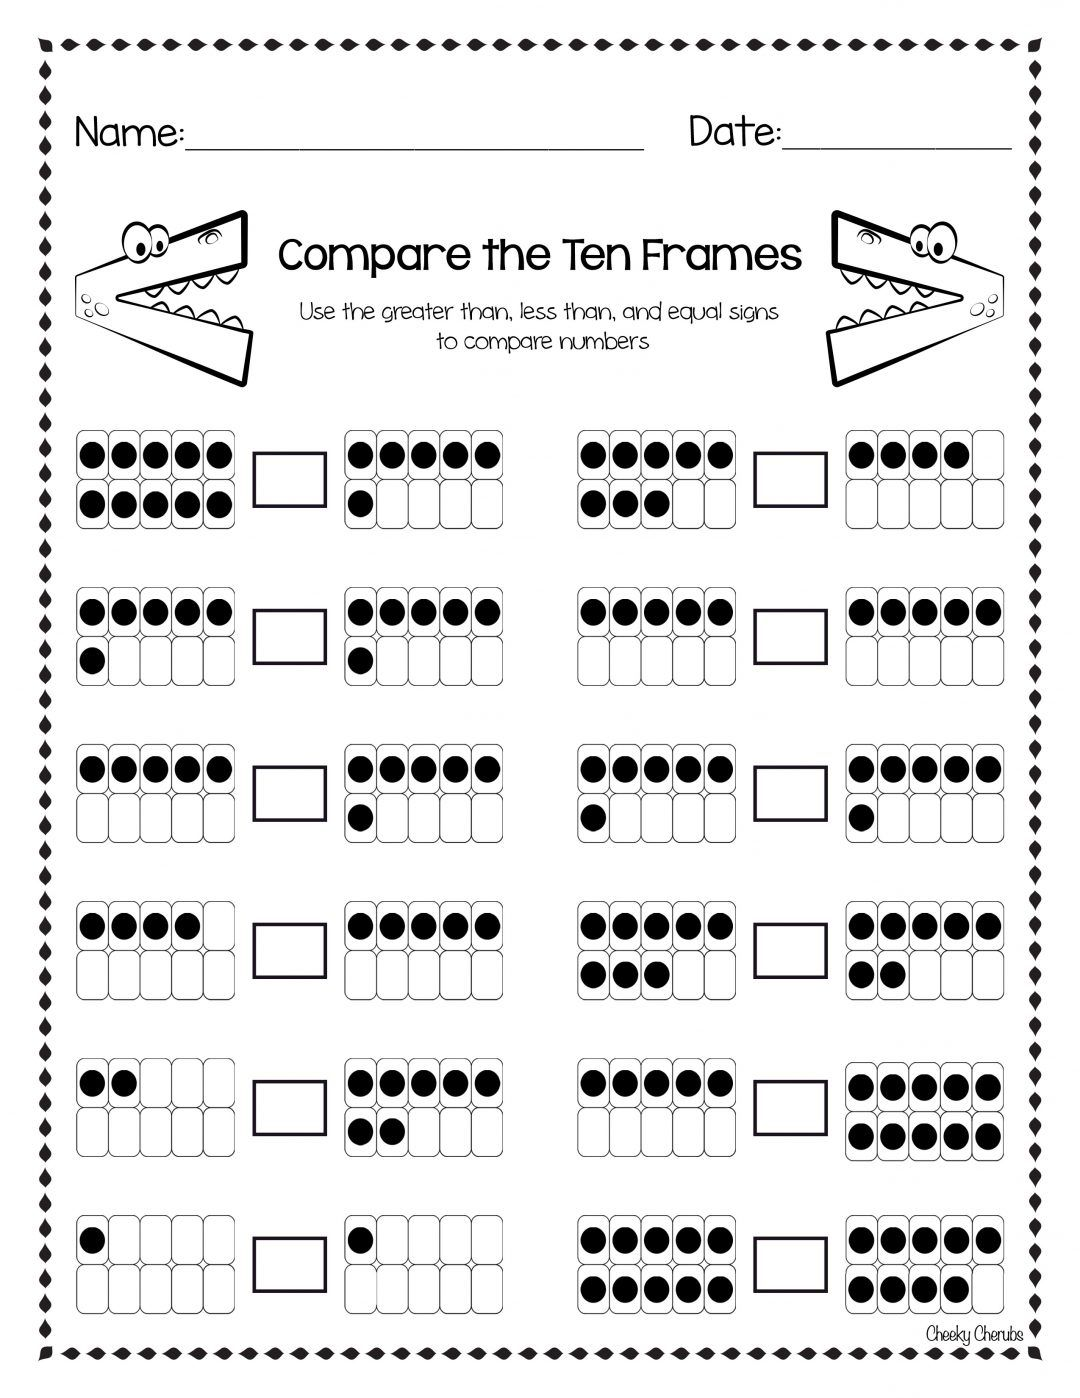 Amazing Freebies For Amazing Teachers The Cheekycherubs Numbers Kindergarten Kindergarten Freebies First Grade Math